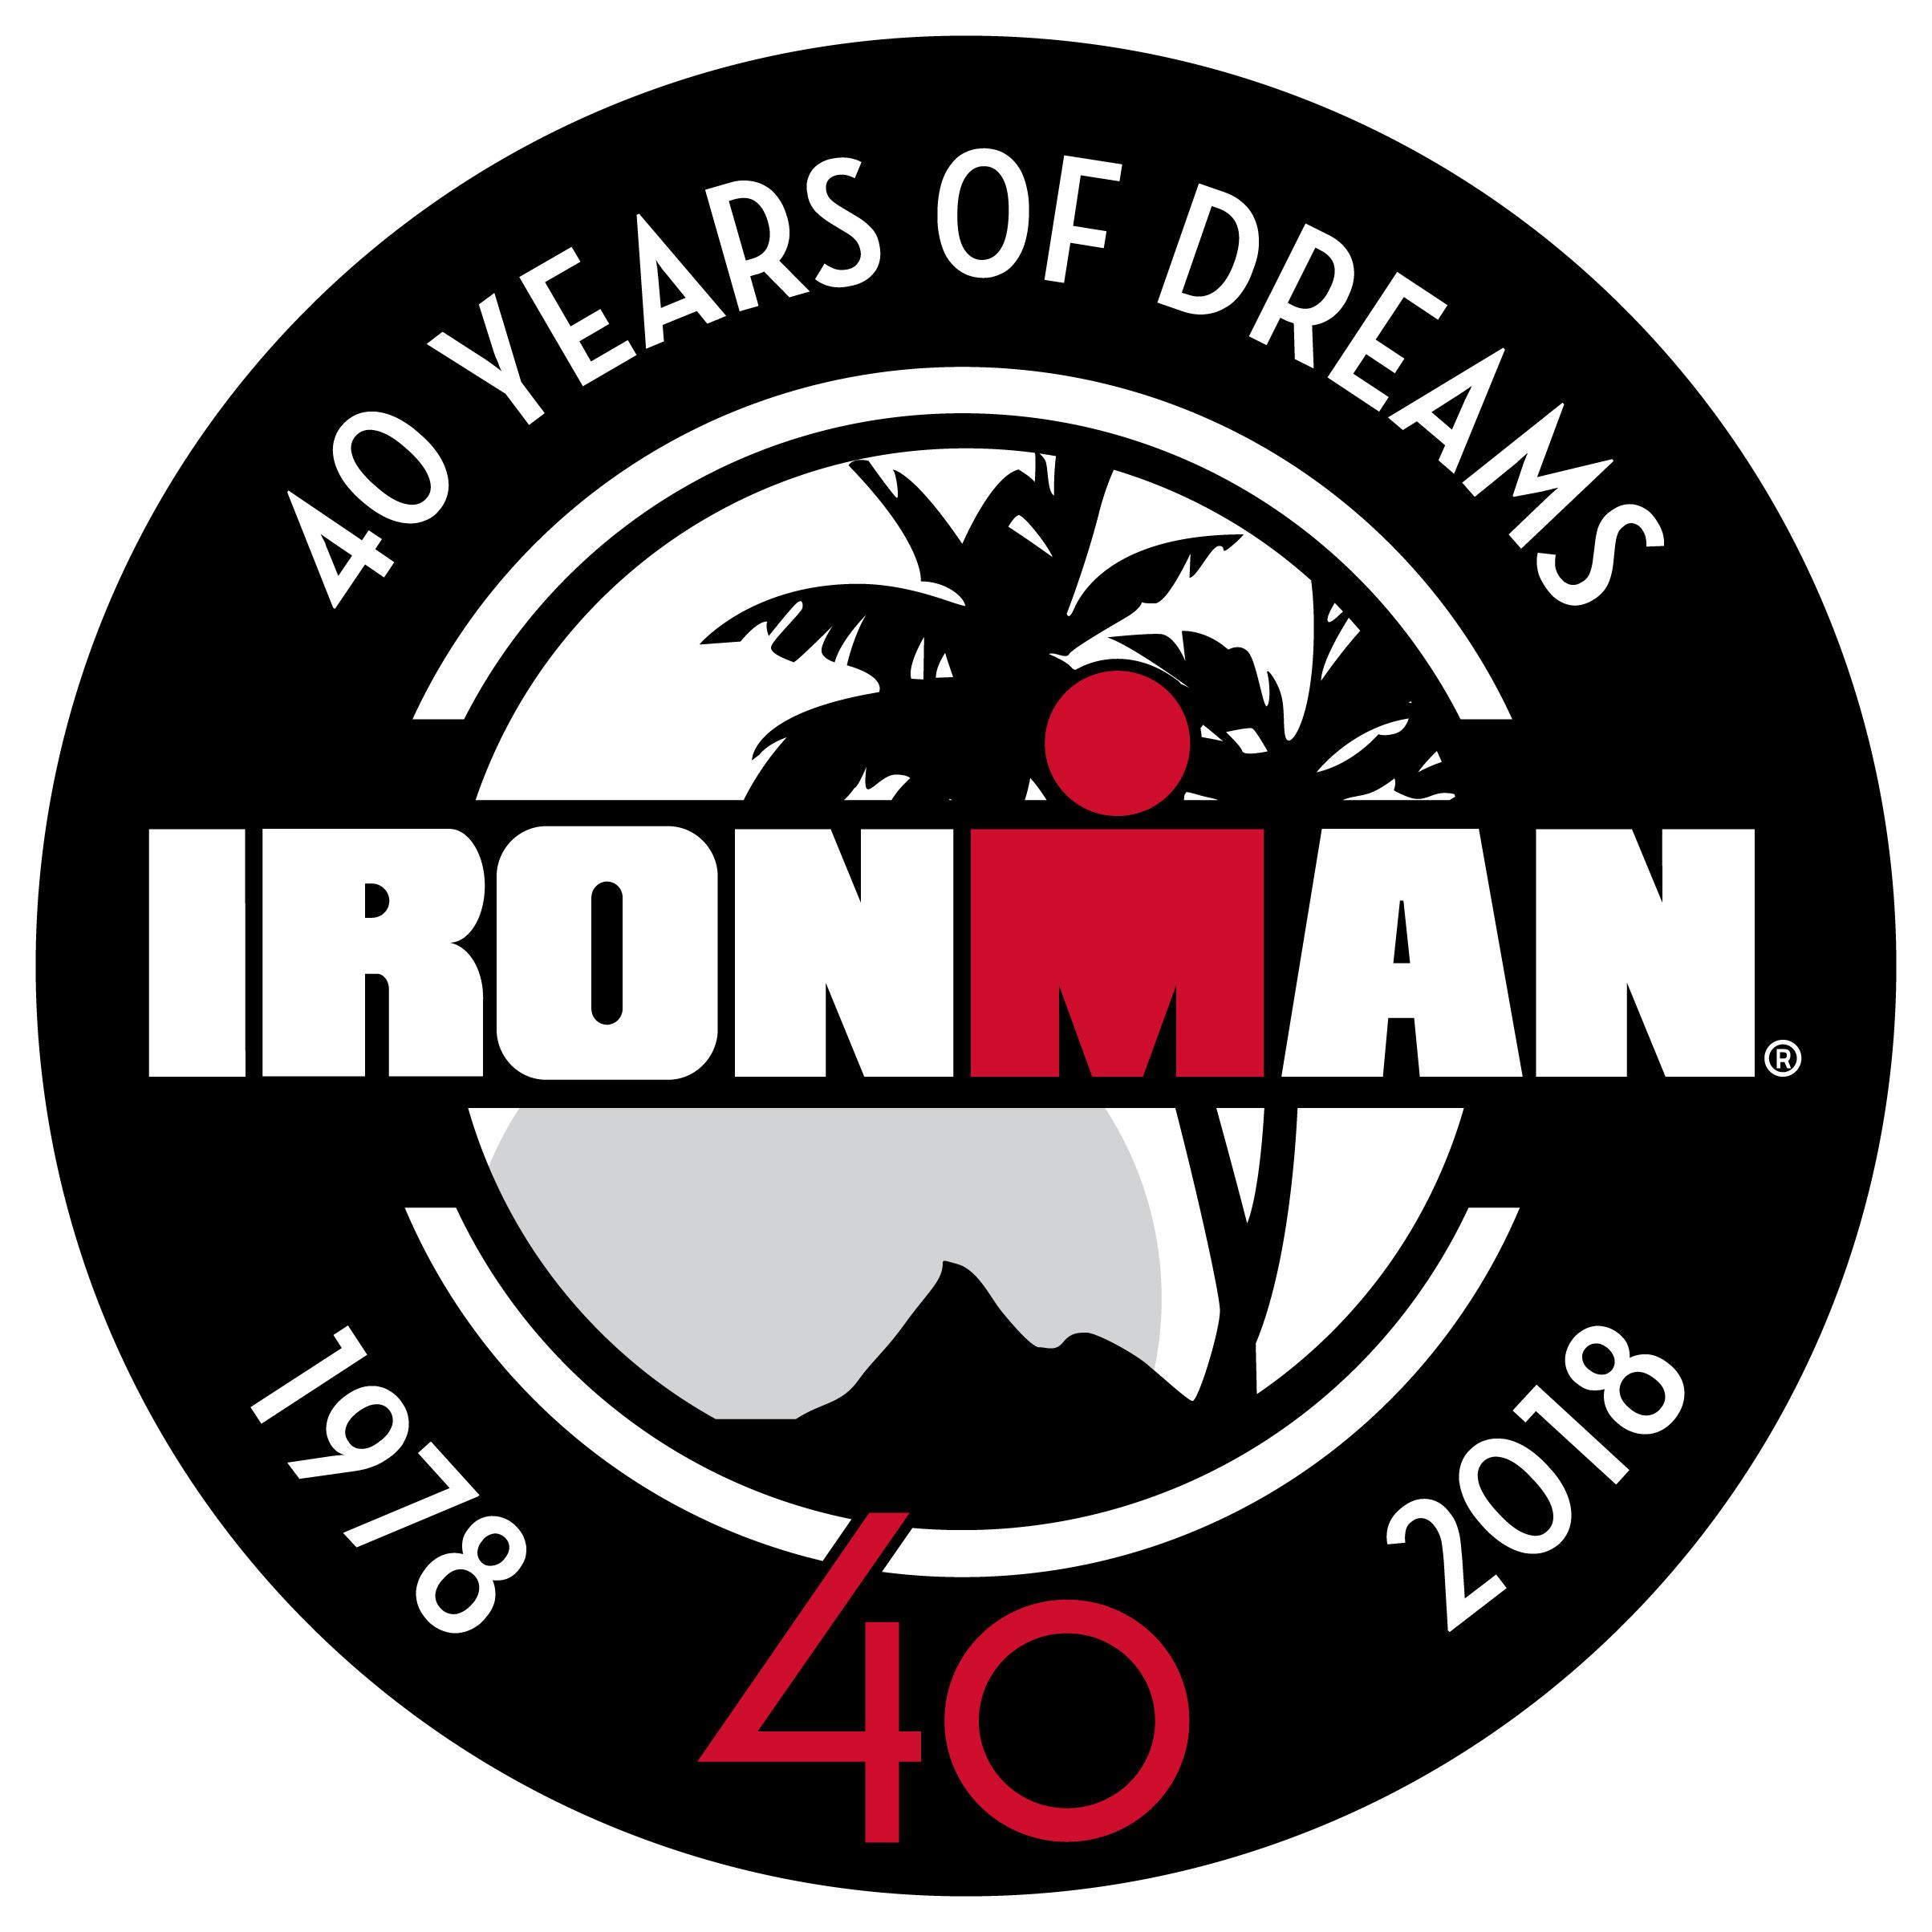 ironman_40yearsofdreams